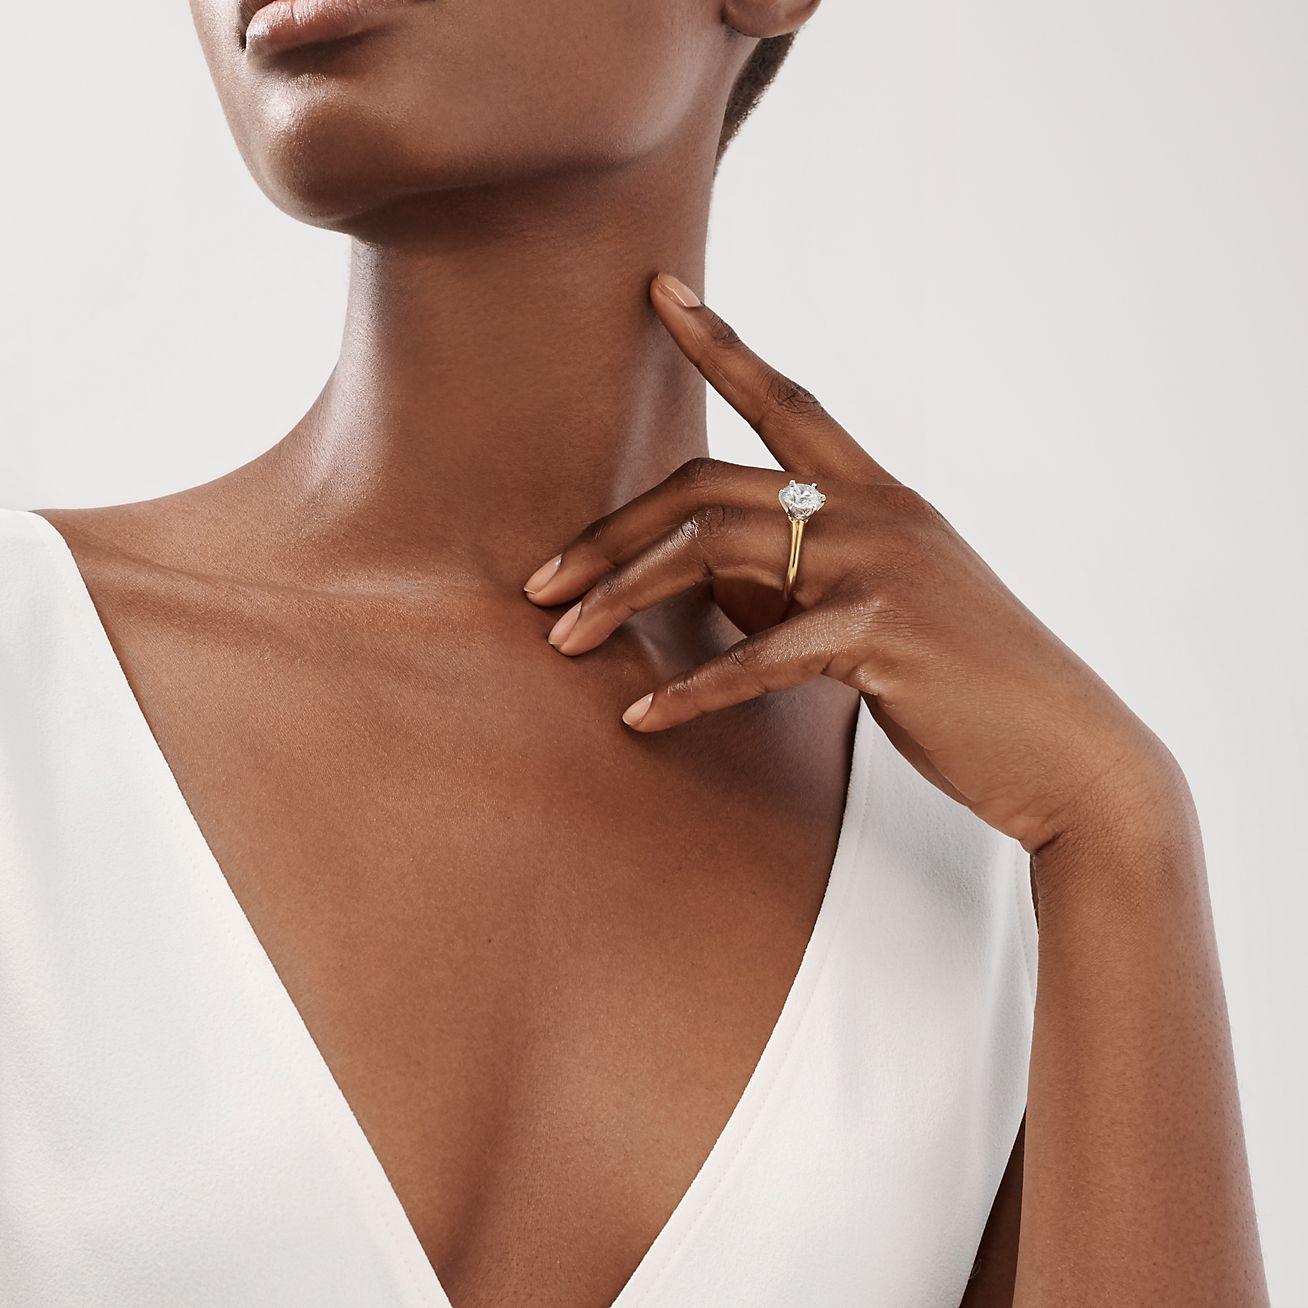 CZ Cubic Zirconia Moissanite 0.75 Carat Round Cut Engagement Ring Channel Setting 18K 14K GoldRose GoldWhite GoldPlatinumS925 Silver